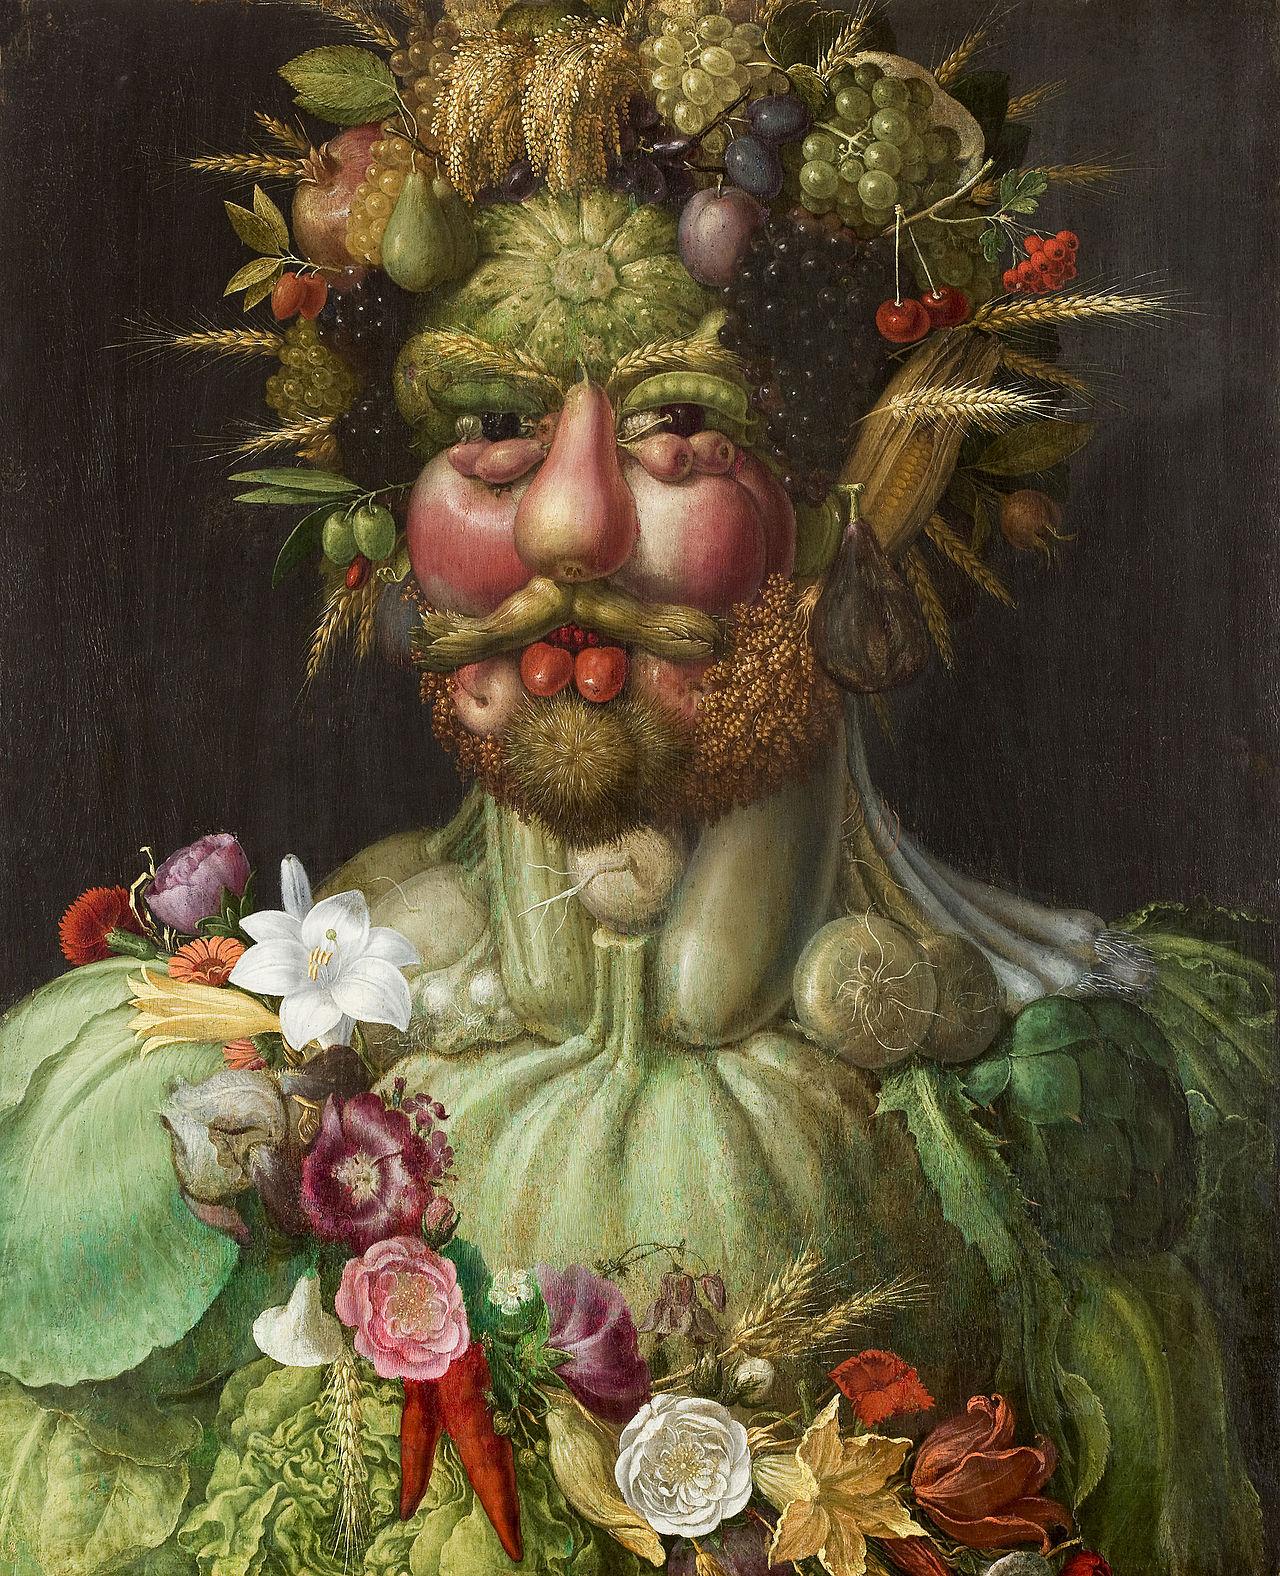 Guiseppe Arcimboldo, Rudolph II as Vertumnus, c. 1590–1591